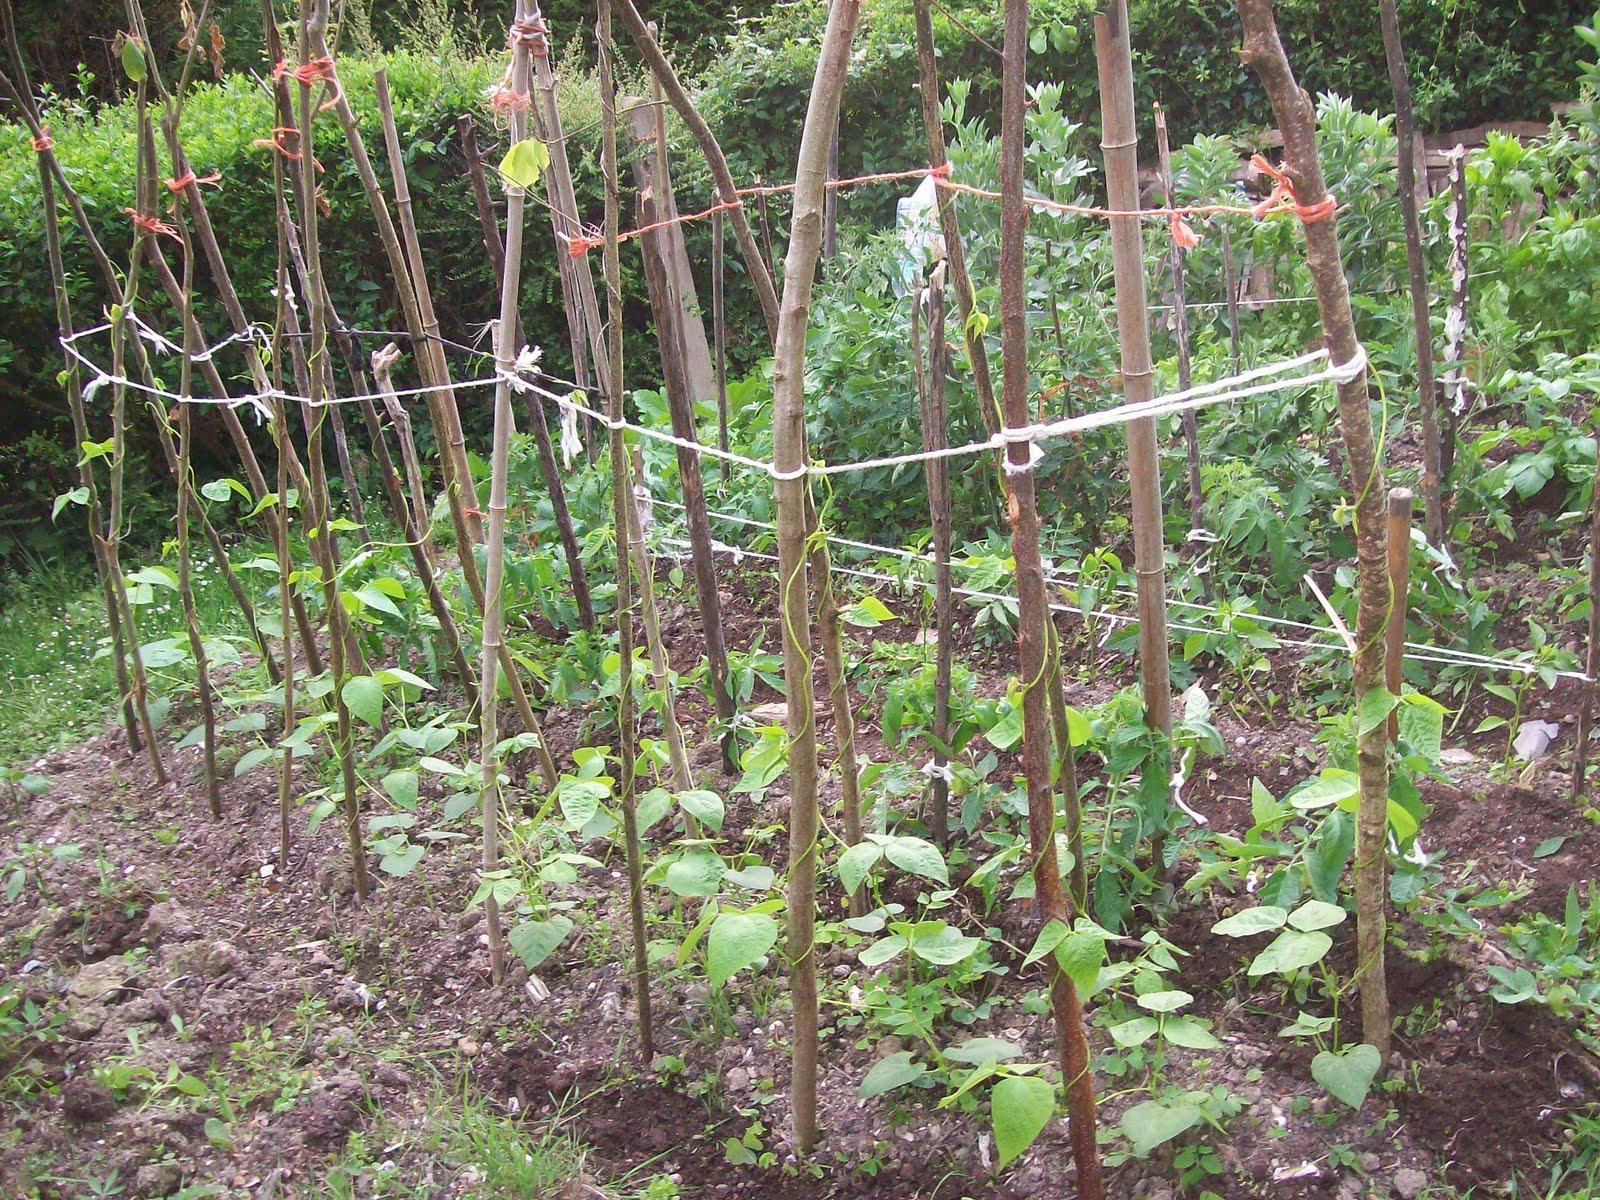 Collacios de la guerta judias verdes - Cultivar judias verdes ...